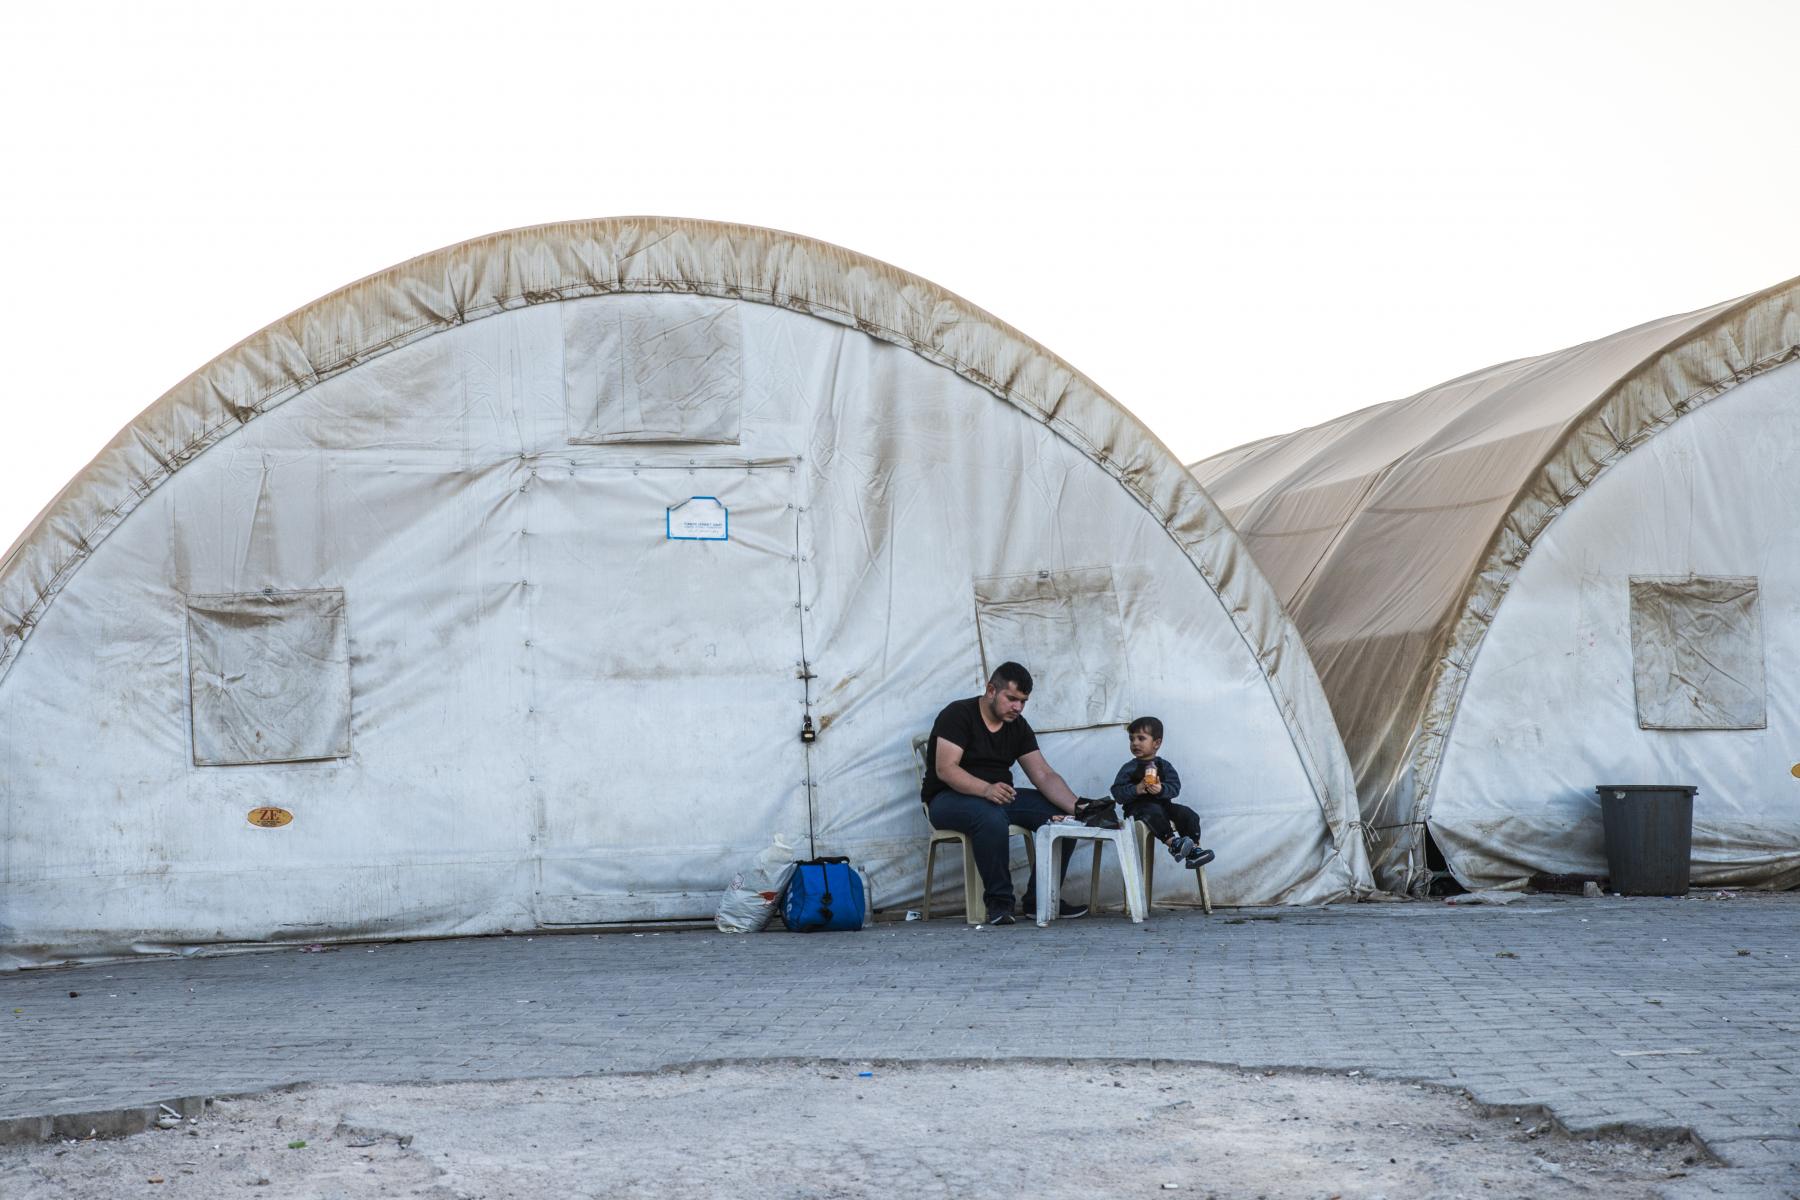 22821944-refugee-camp-for-syrian-people-in-turkey-september-7.jpg